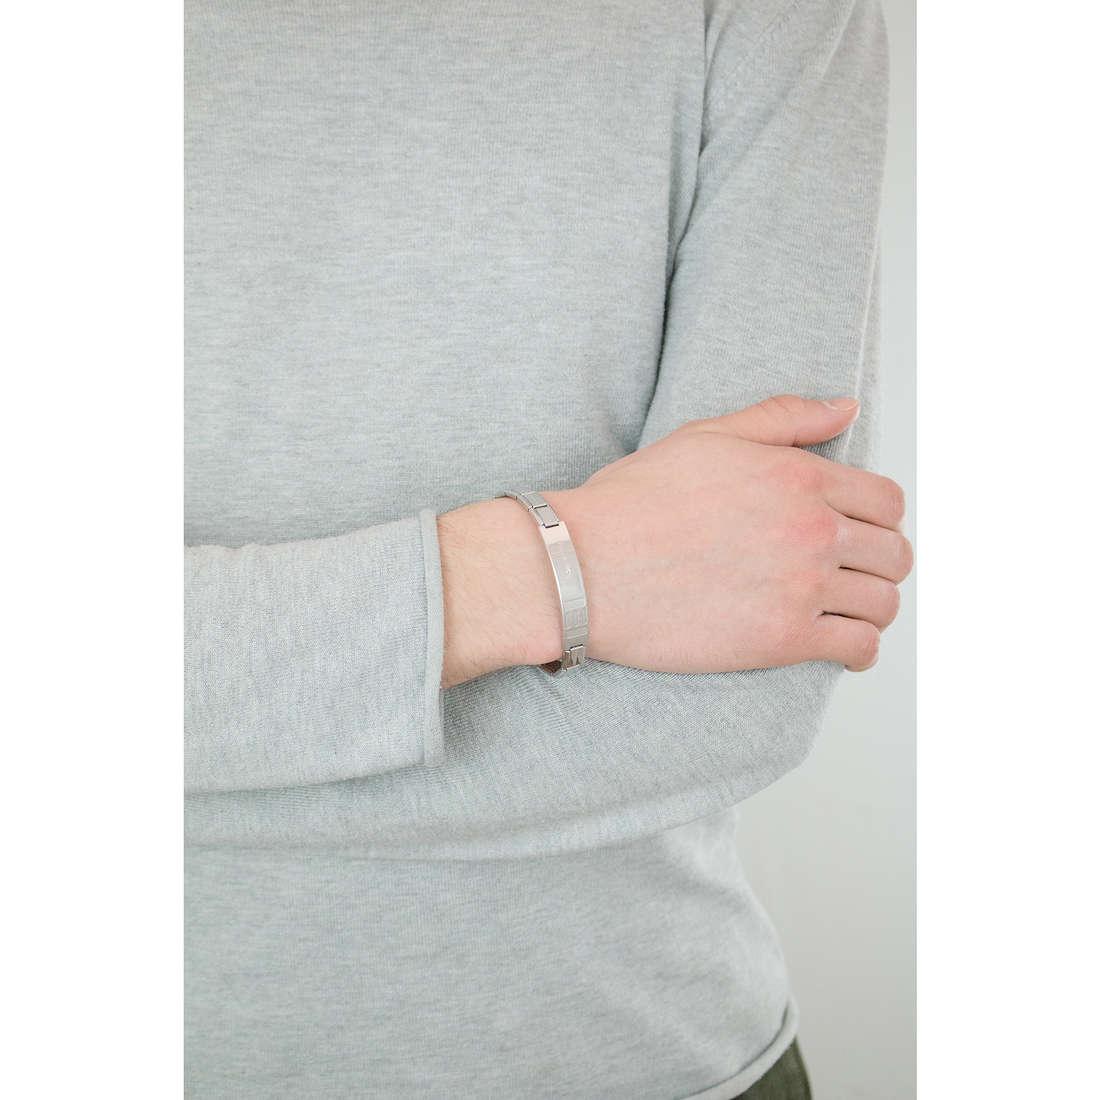 Nomination bracciali Trendsetter uomo 021108/008/004 indosso